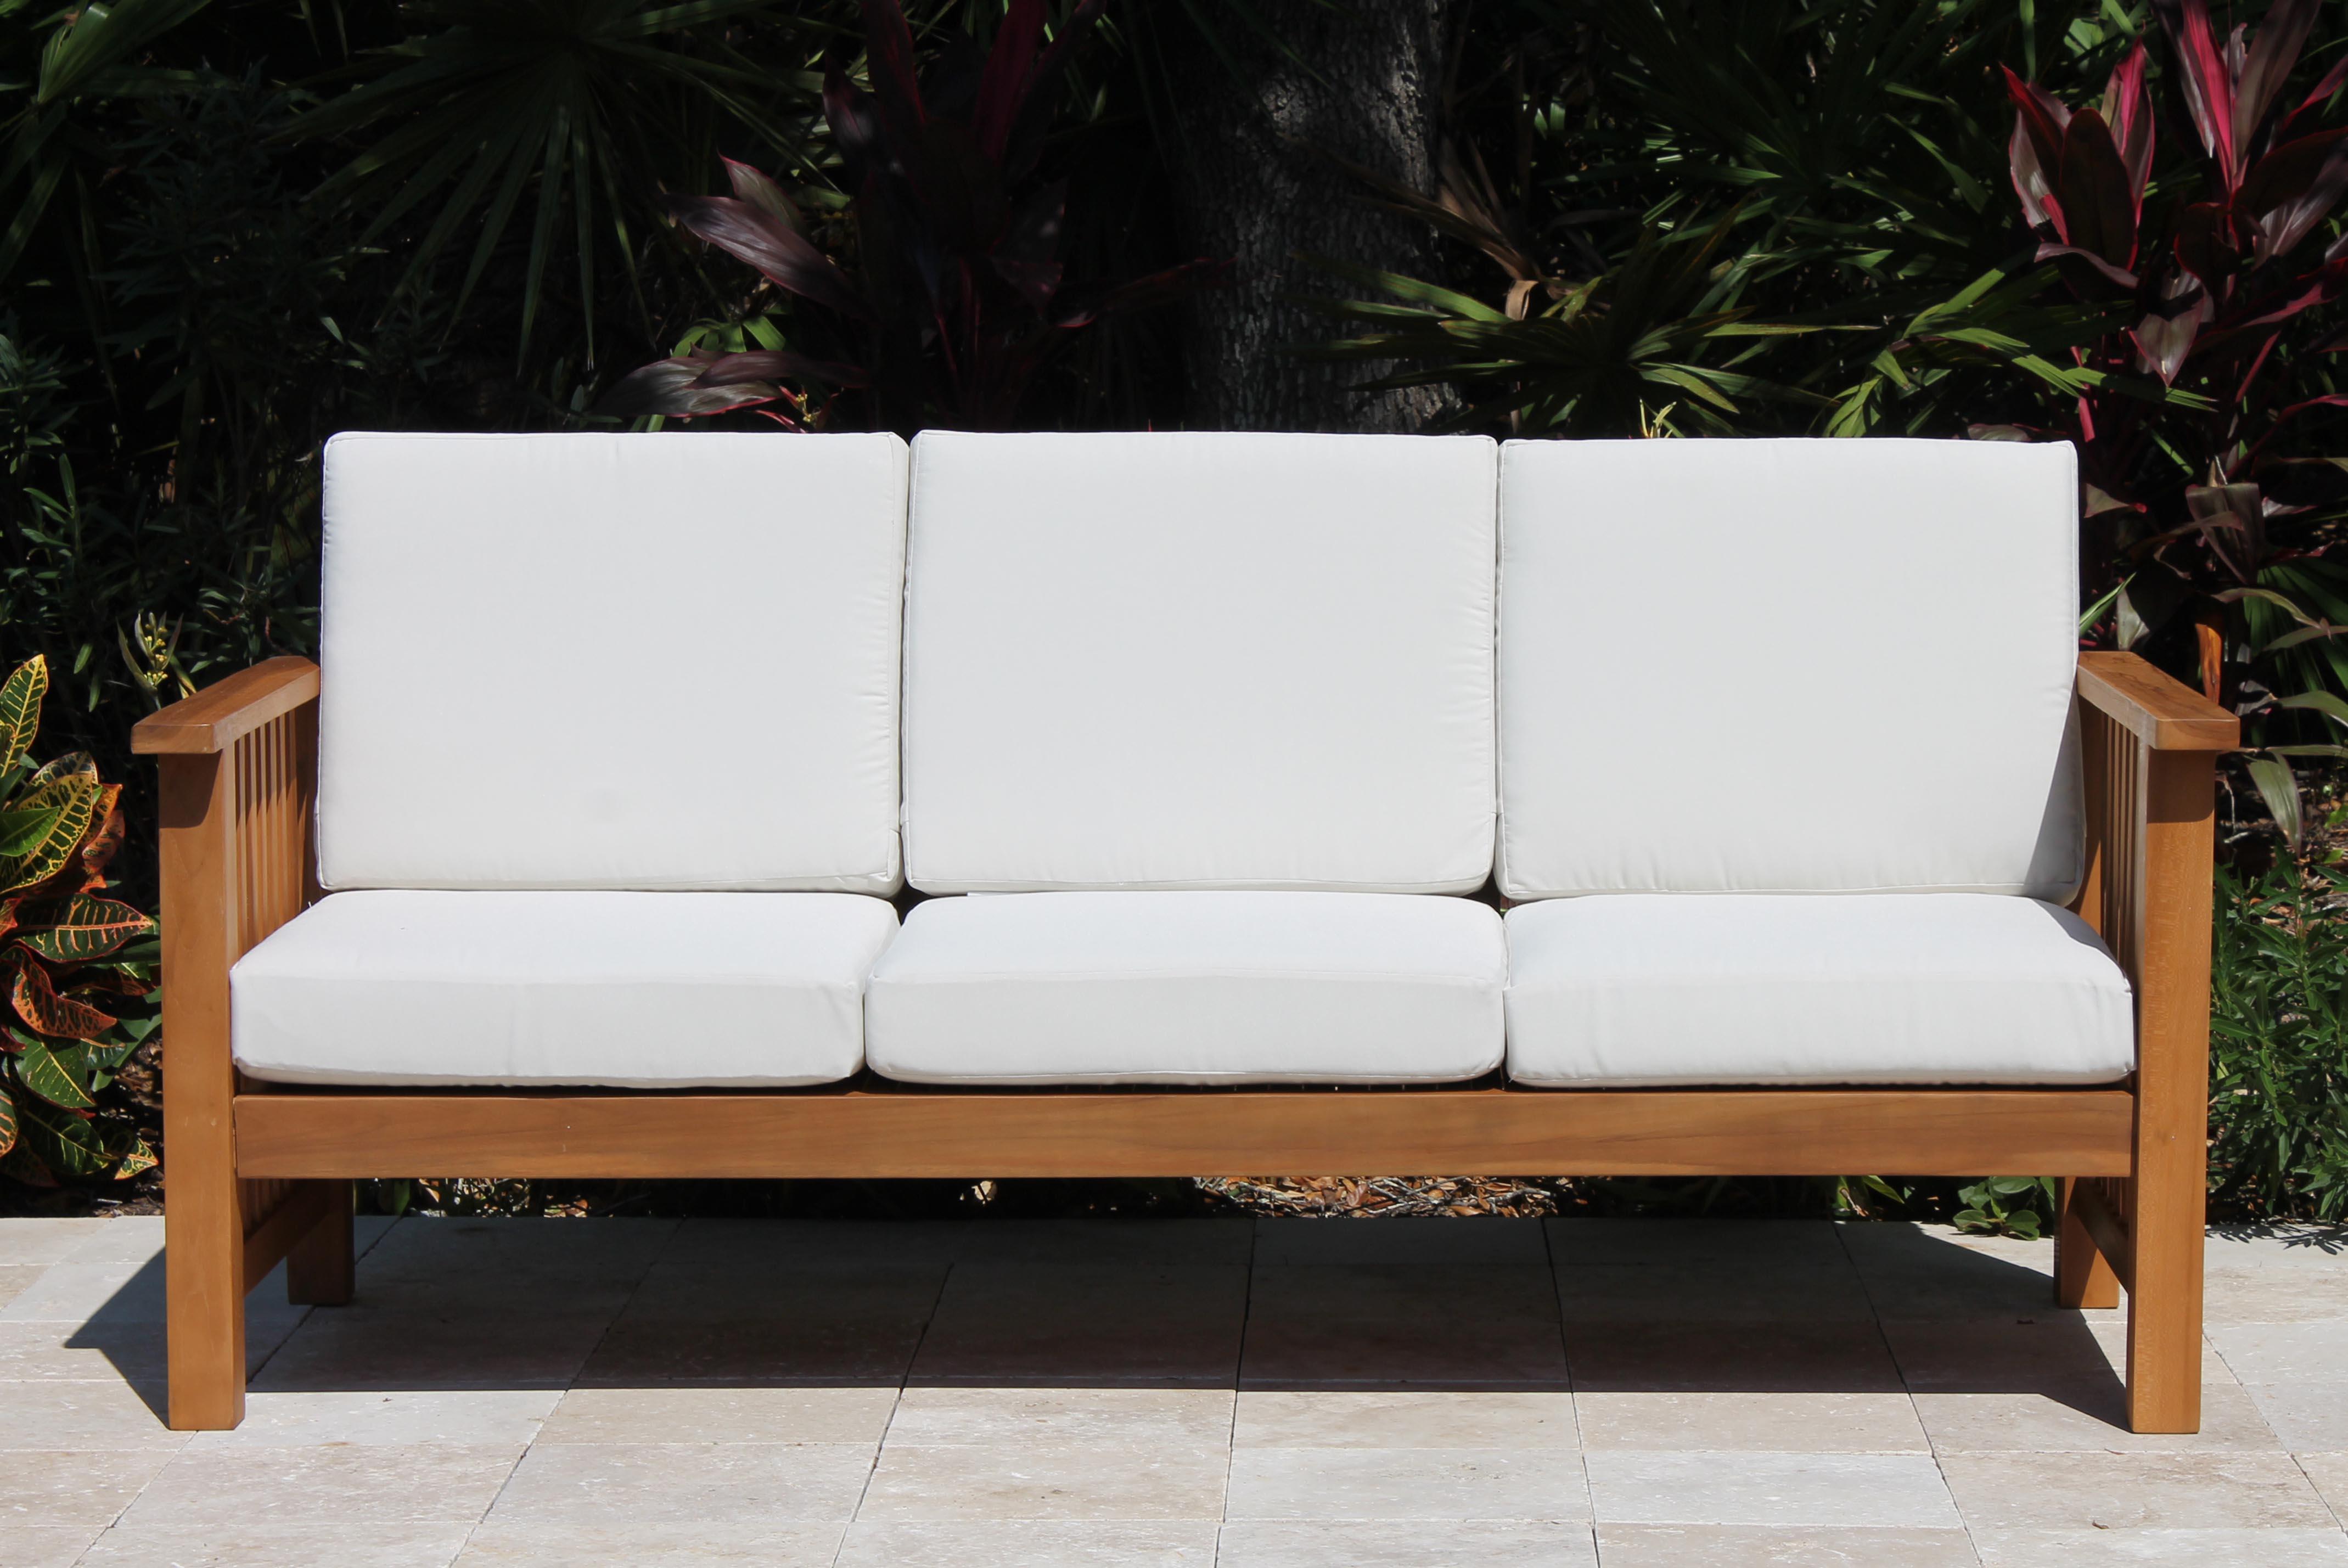 Southampton Deep Seat Teak Sofa Including Full Sunbrella Cushions